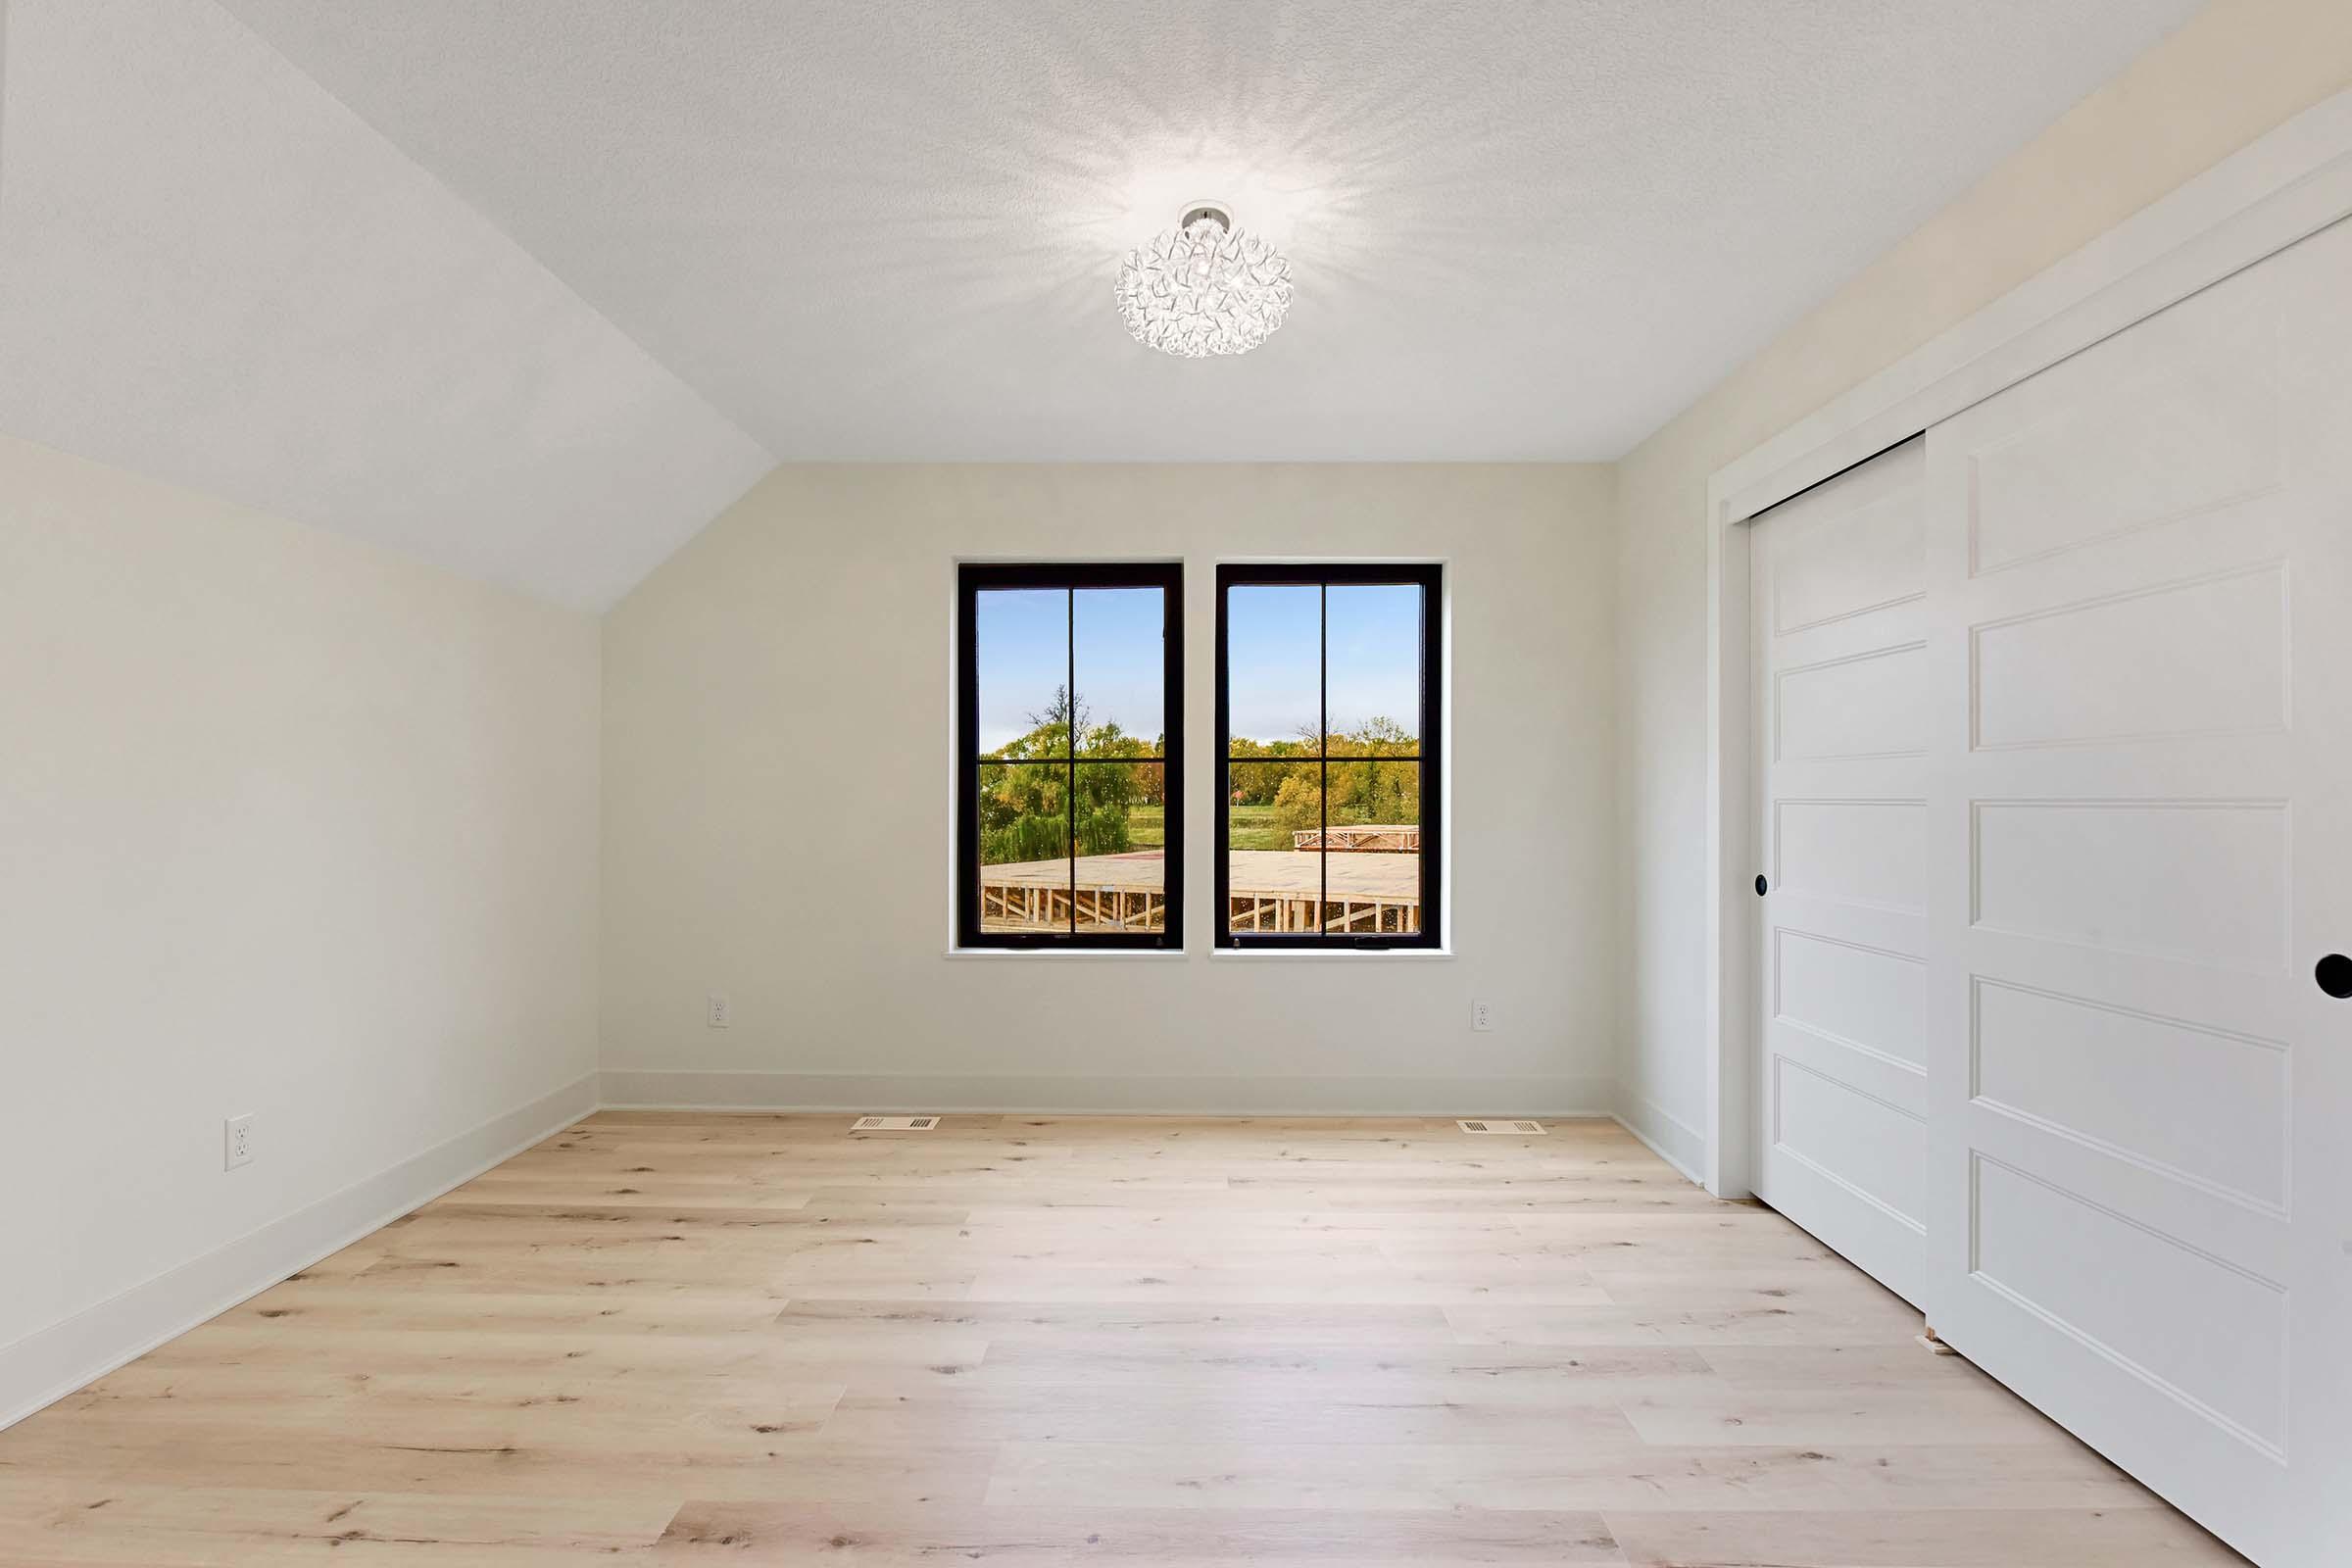 bonus room with two windows and wood flooring above garage